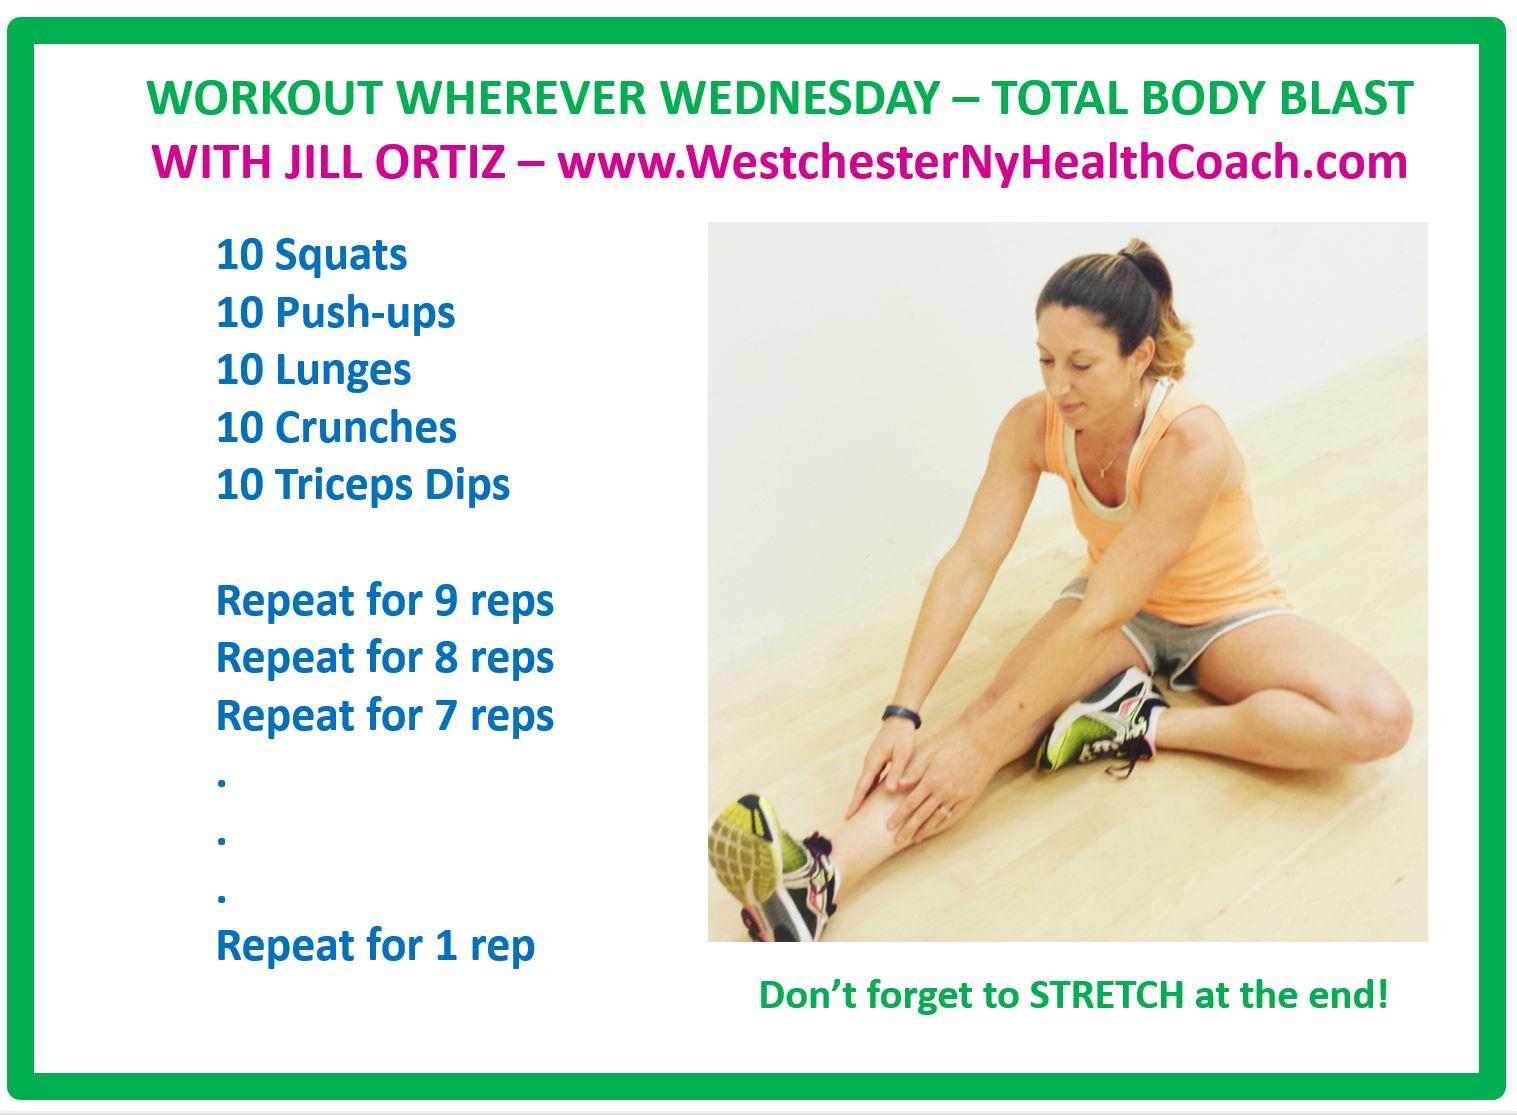 Workout Wherever Wednesday - 3.JPG